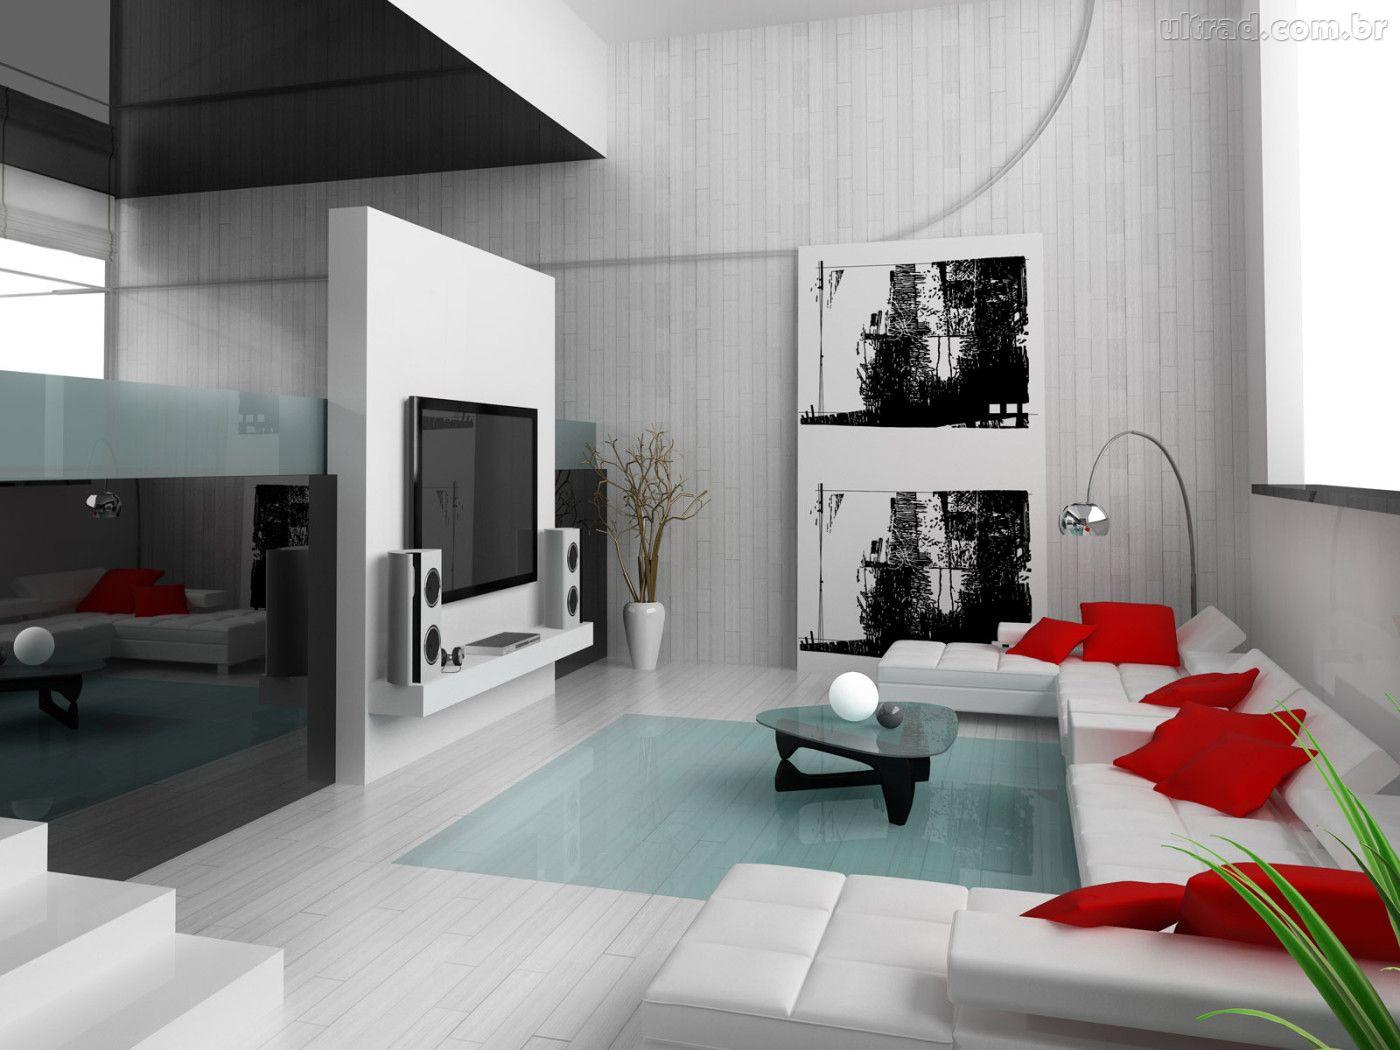 design de interiores. Black Bedroom Furniture Sets. Home Design Ideas